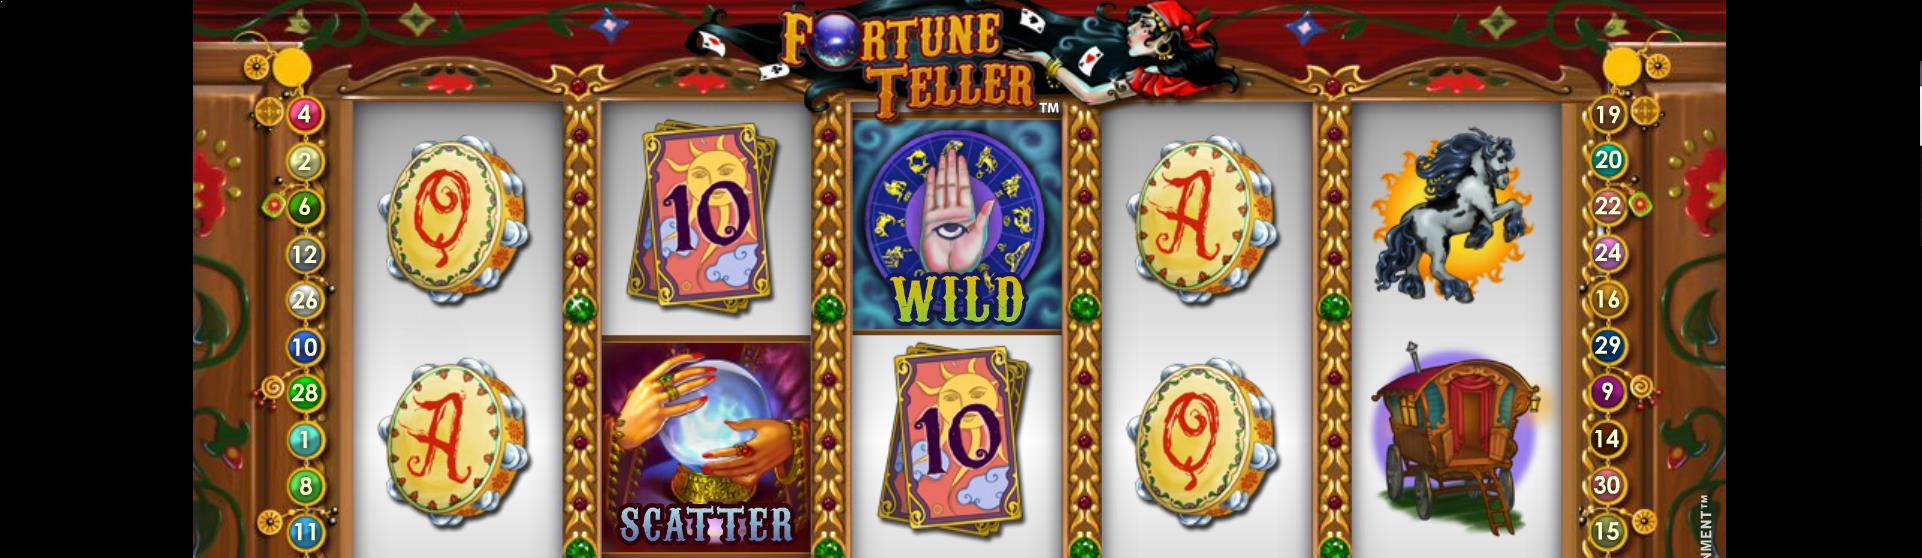 fortune teller jocuri slot multa bafta